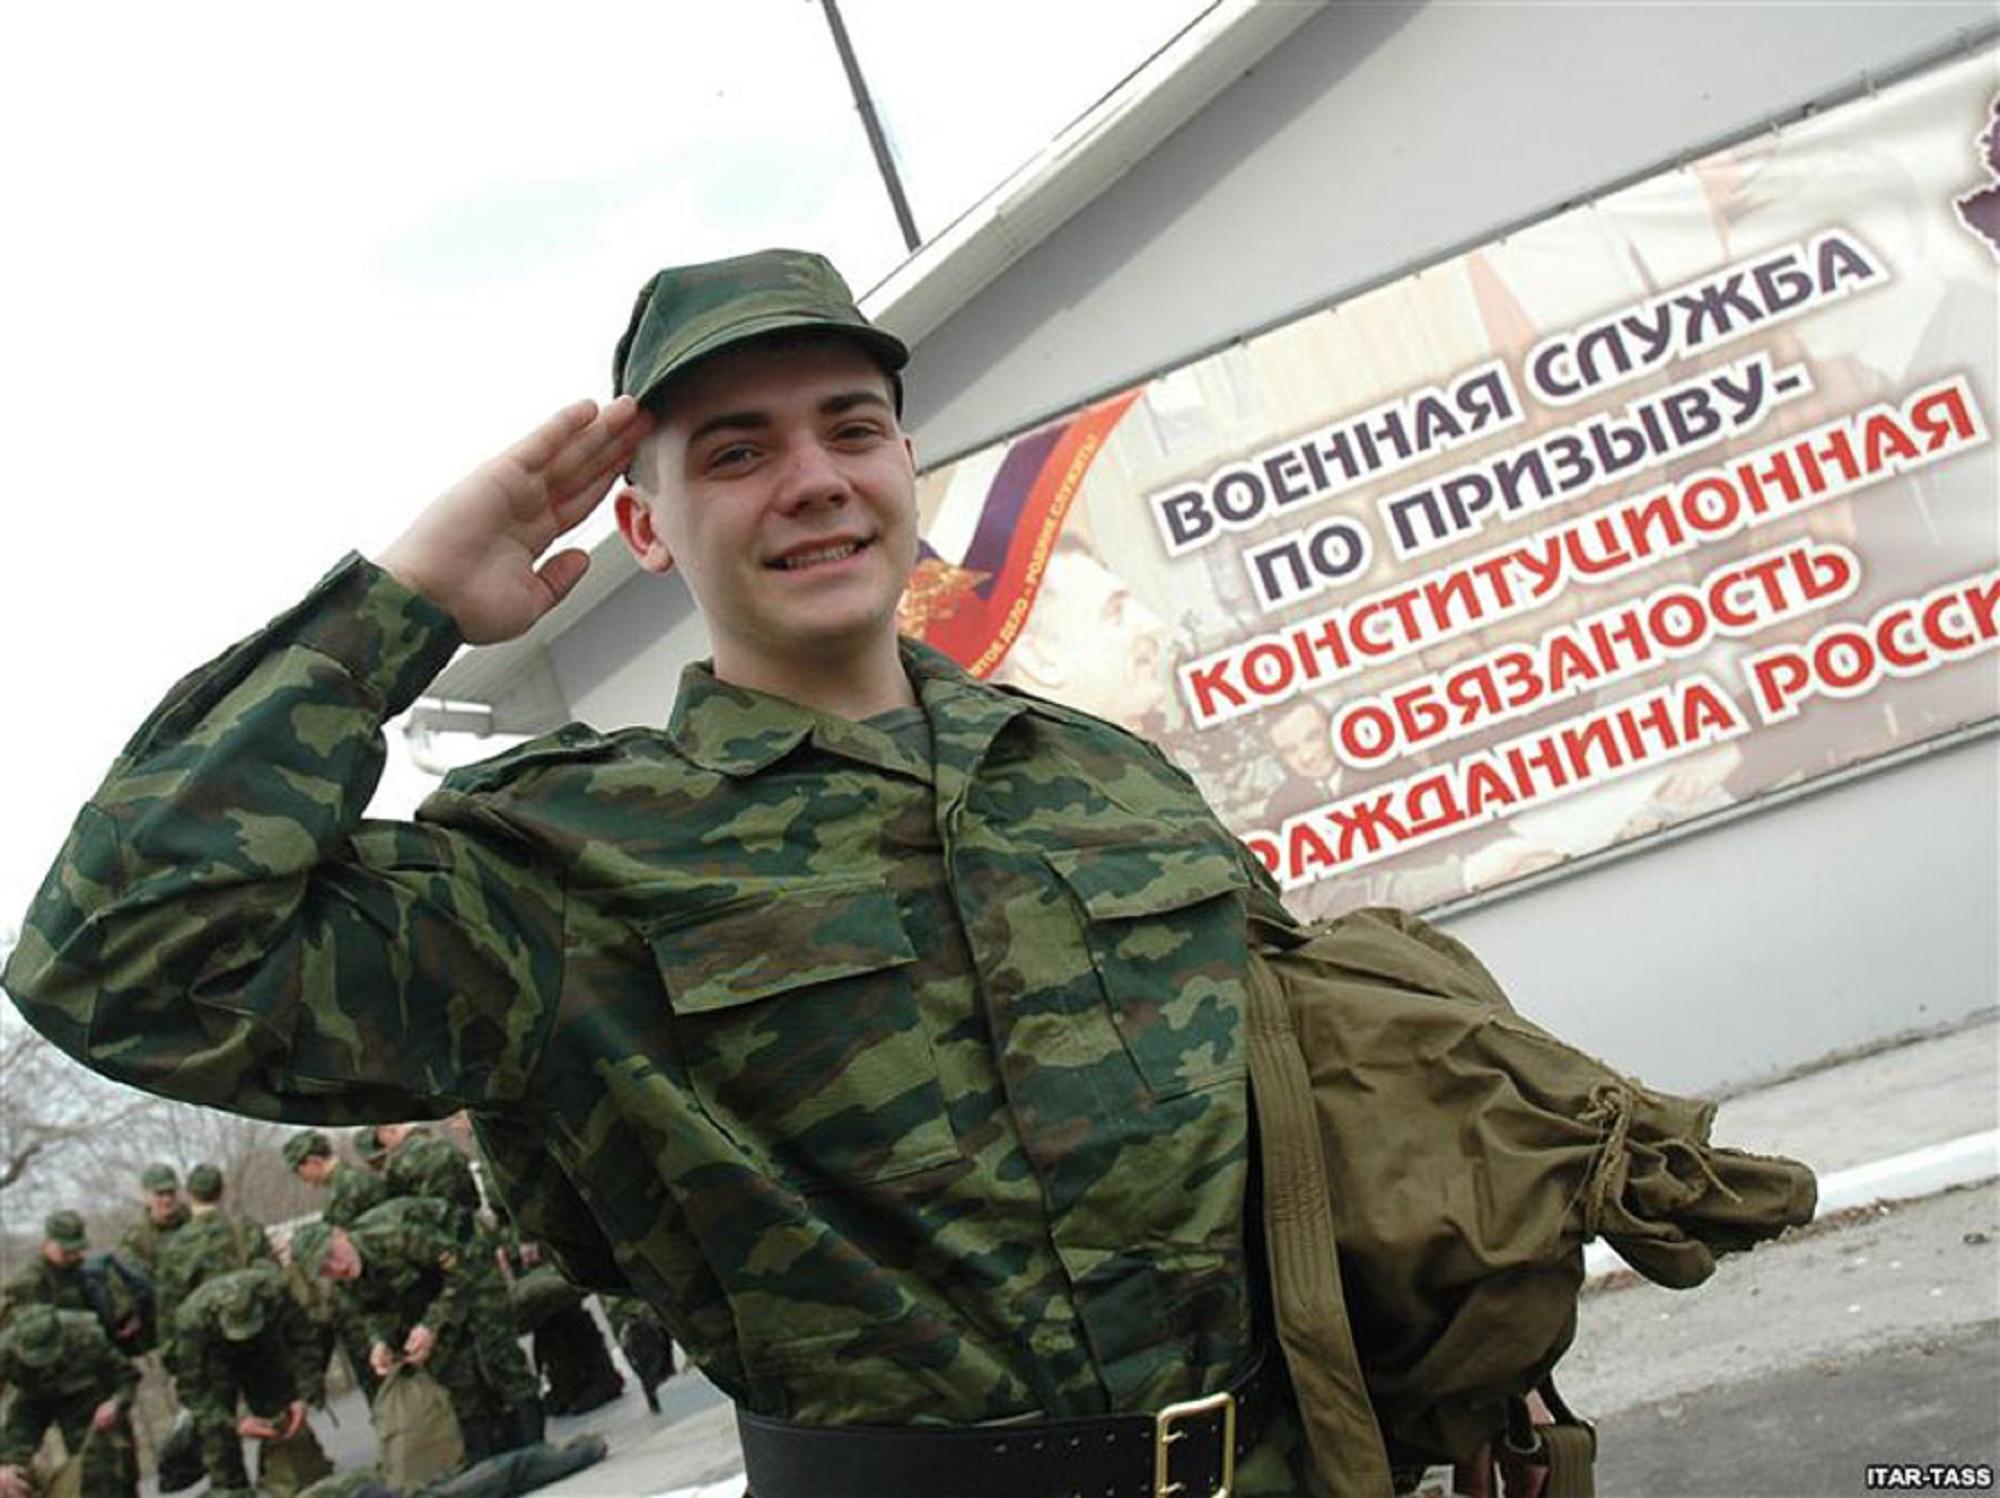 http://prospekt45.ru/wp-content/uploads/2017/09/prizyv.jpg